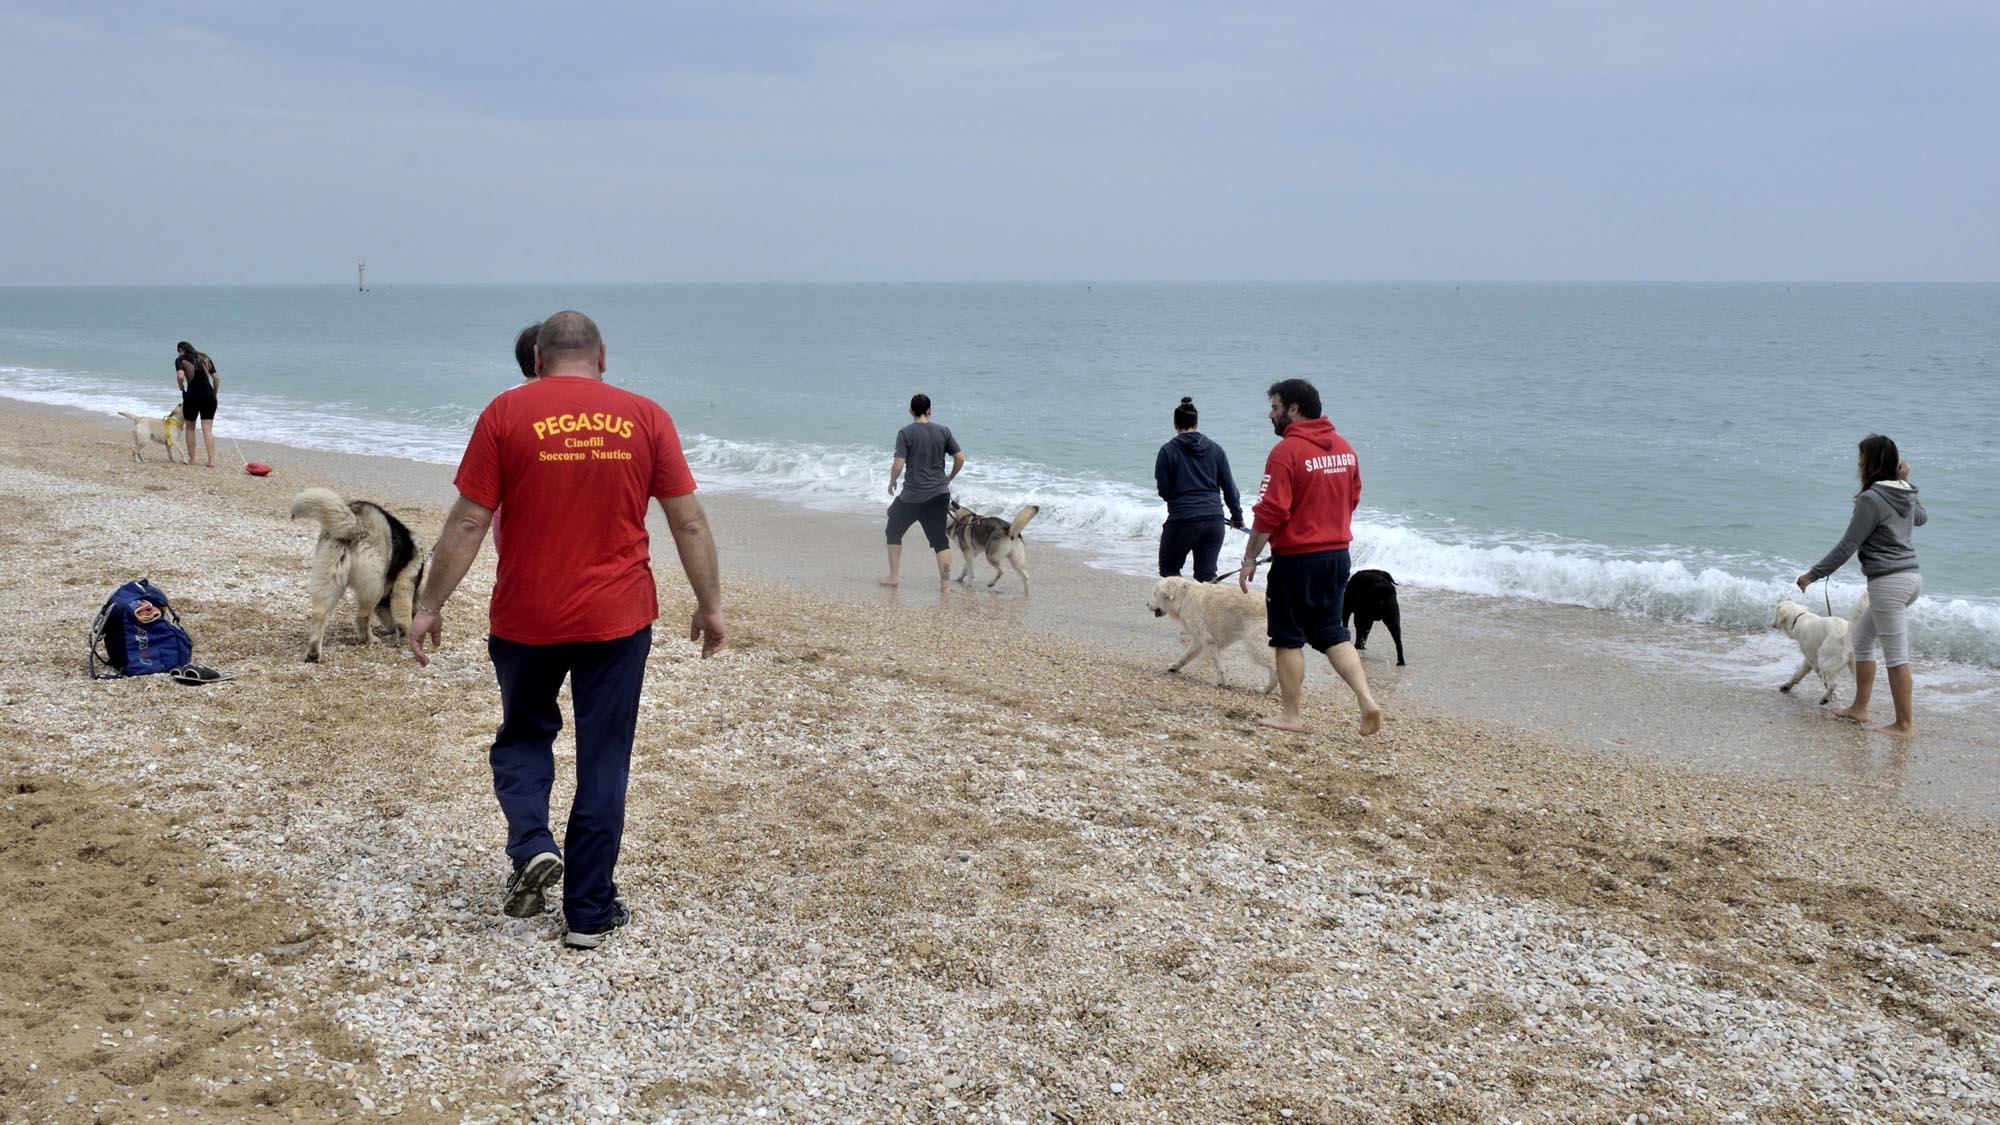 0106 soccorso cinofilo addestramento cani - Soccorso cinofilo Pegasus